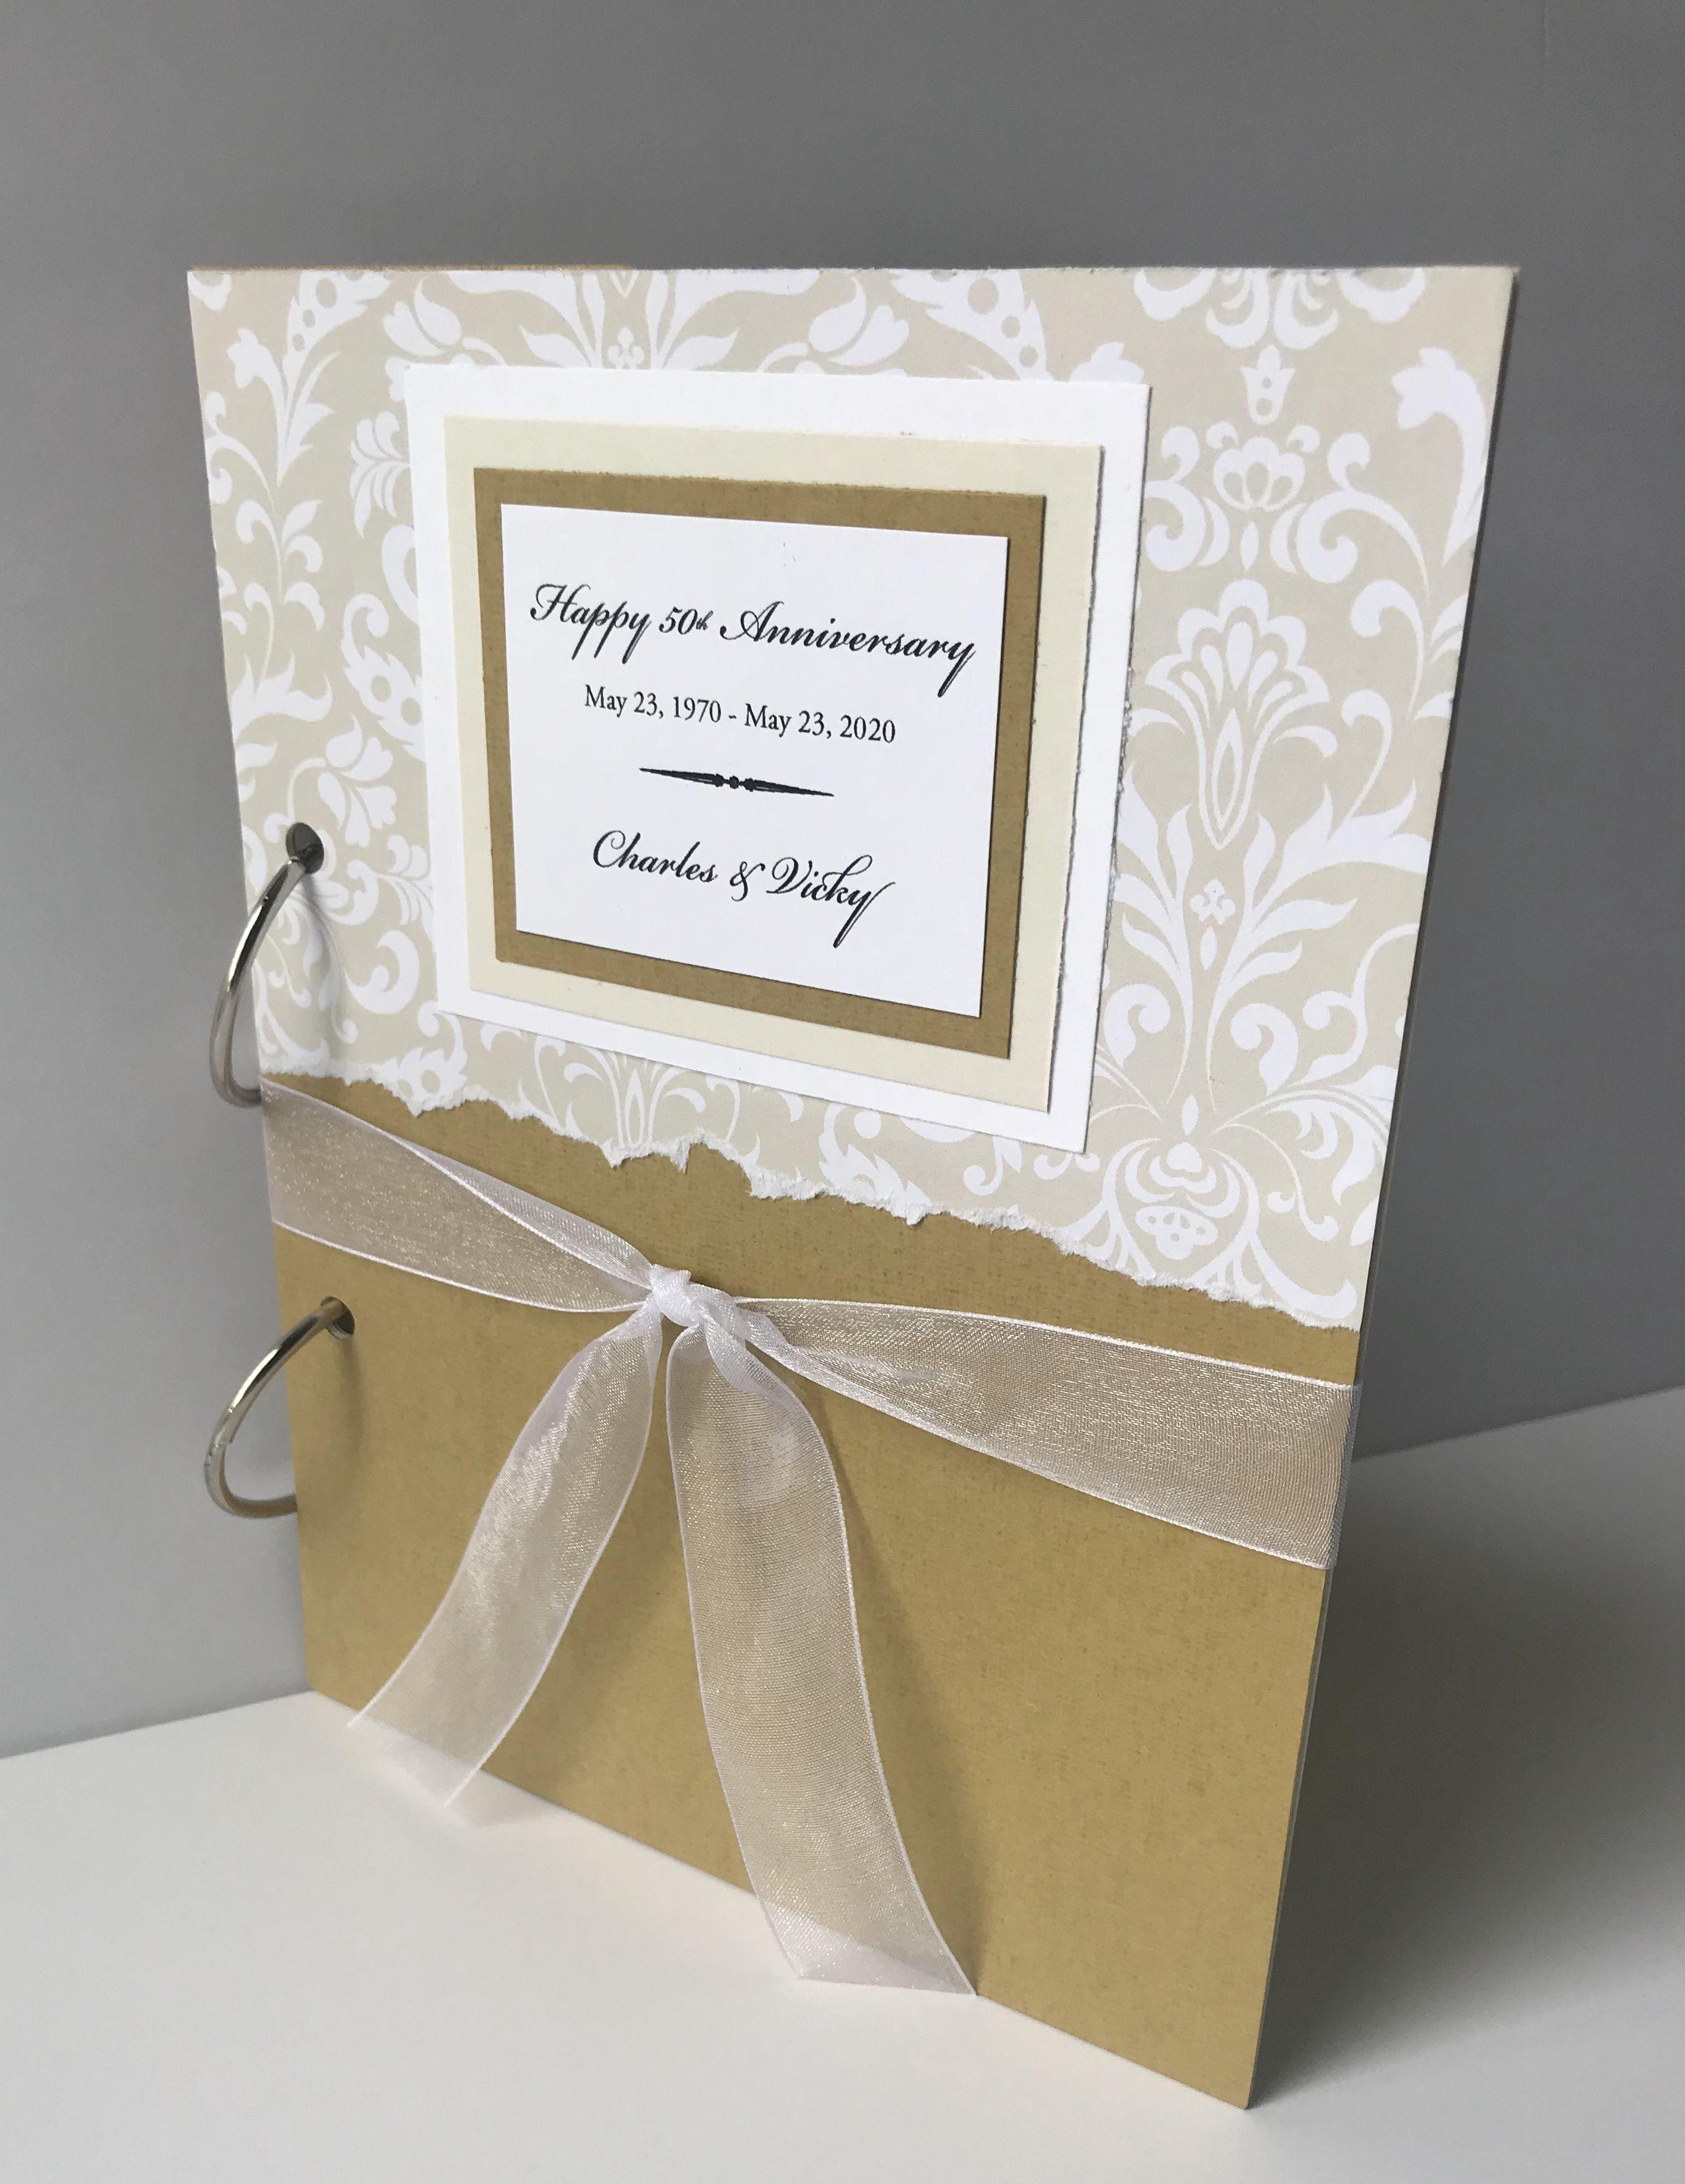 50th Wedding Anniversary Happy Anniversary Gift Greeting Card Holder Anniversary Card Organizer Wedding Card Holder In 2020 Wedding Card Holder 50th Wedding Anniversary Happy Anniversary Gifts